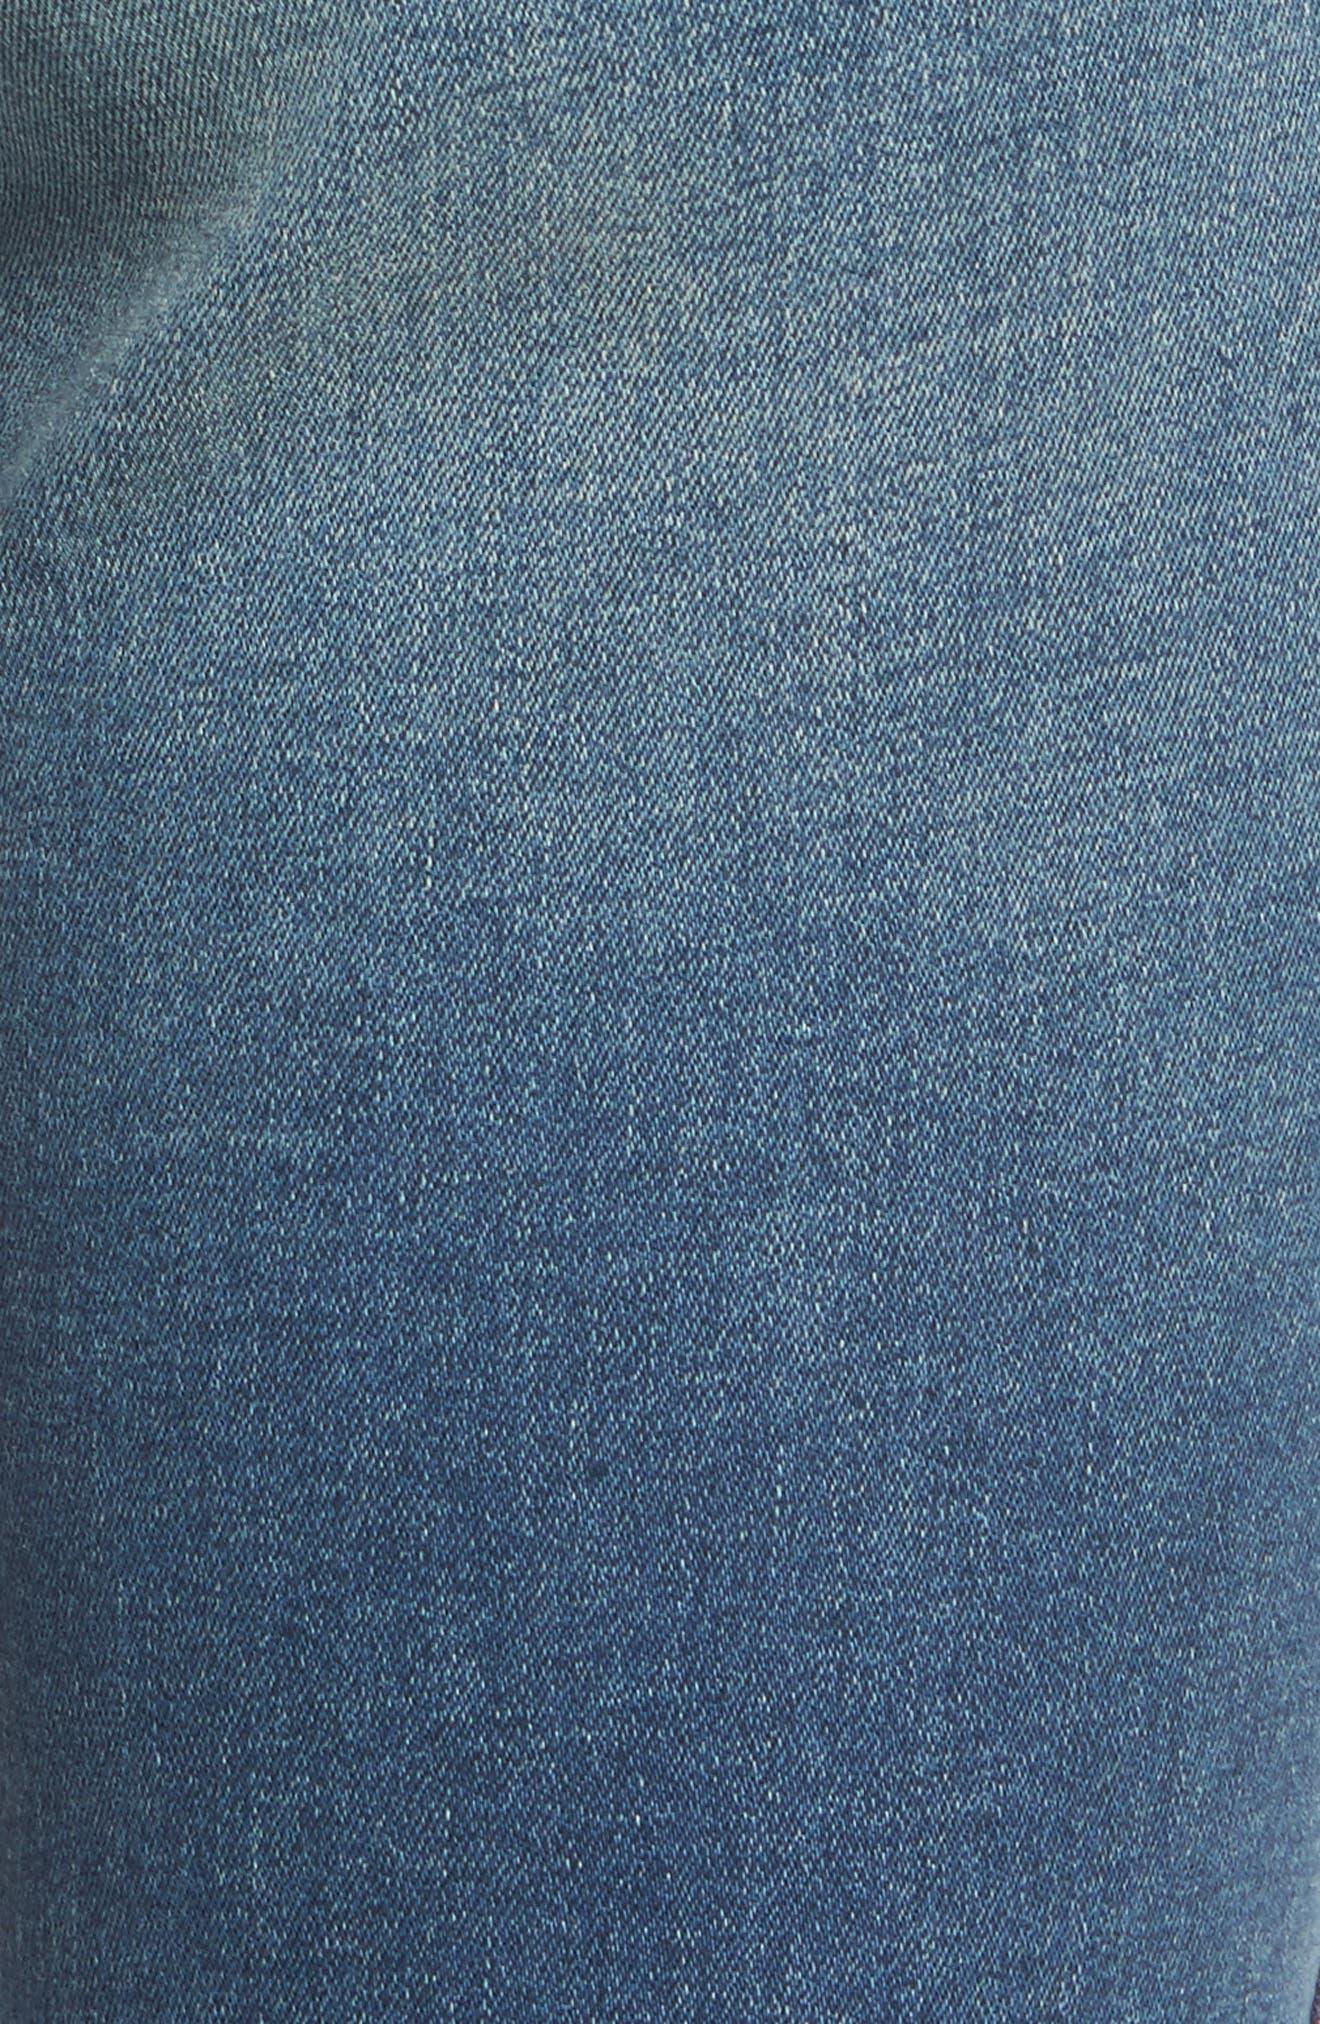 Alternate Image 5  - Current/Elliott The High Waist Stiletto Ankle Skinny Jeans (Powell/Applied Stripe)